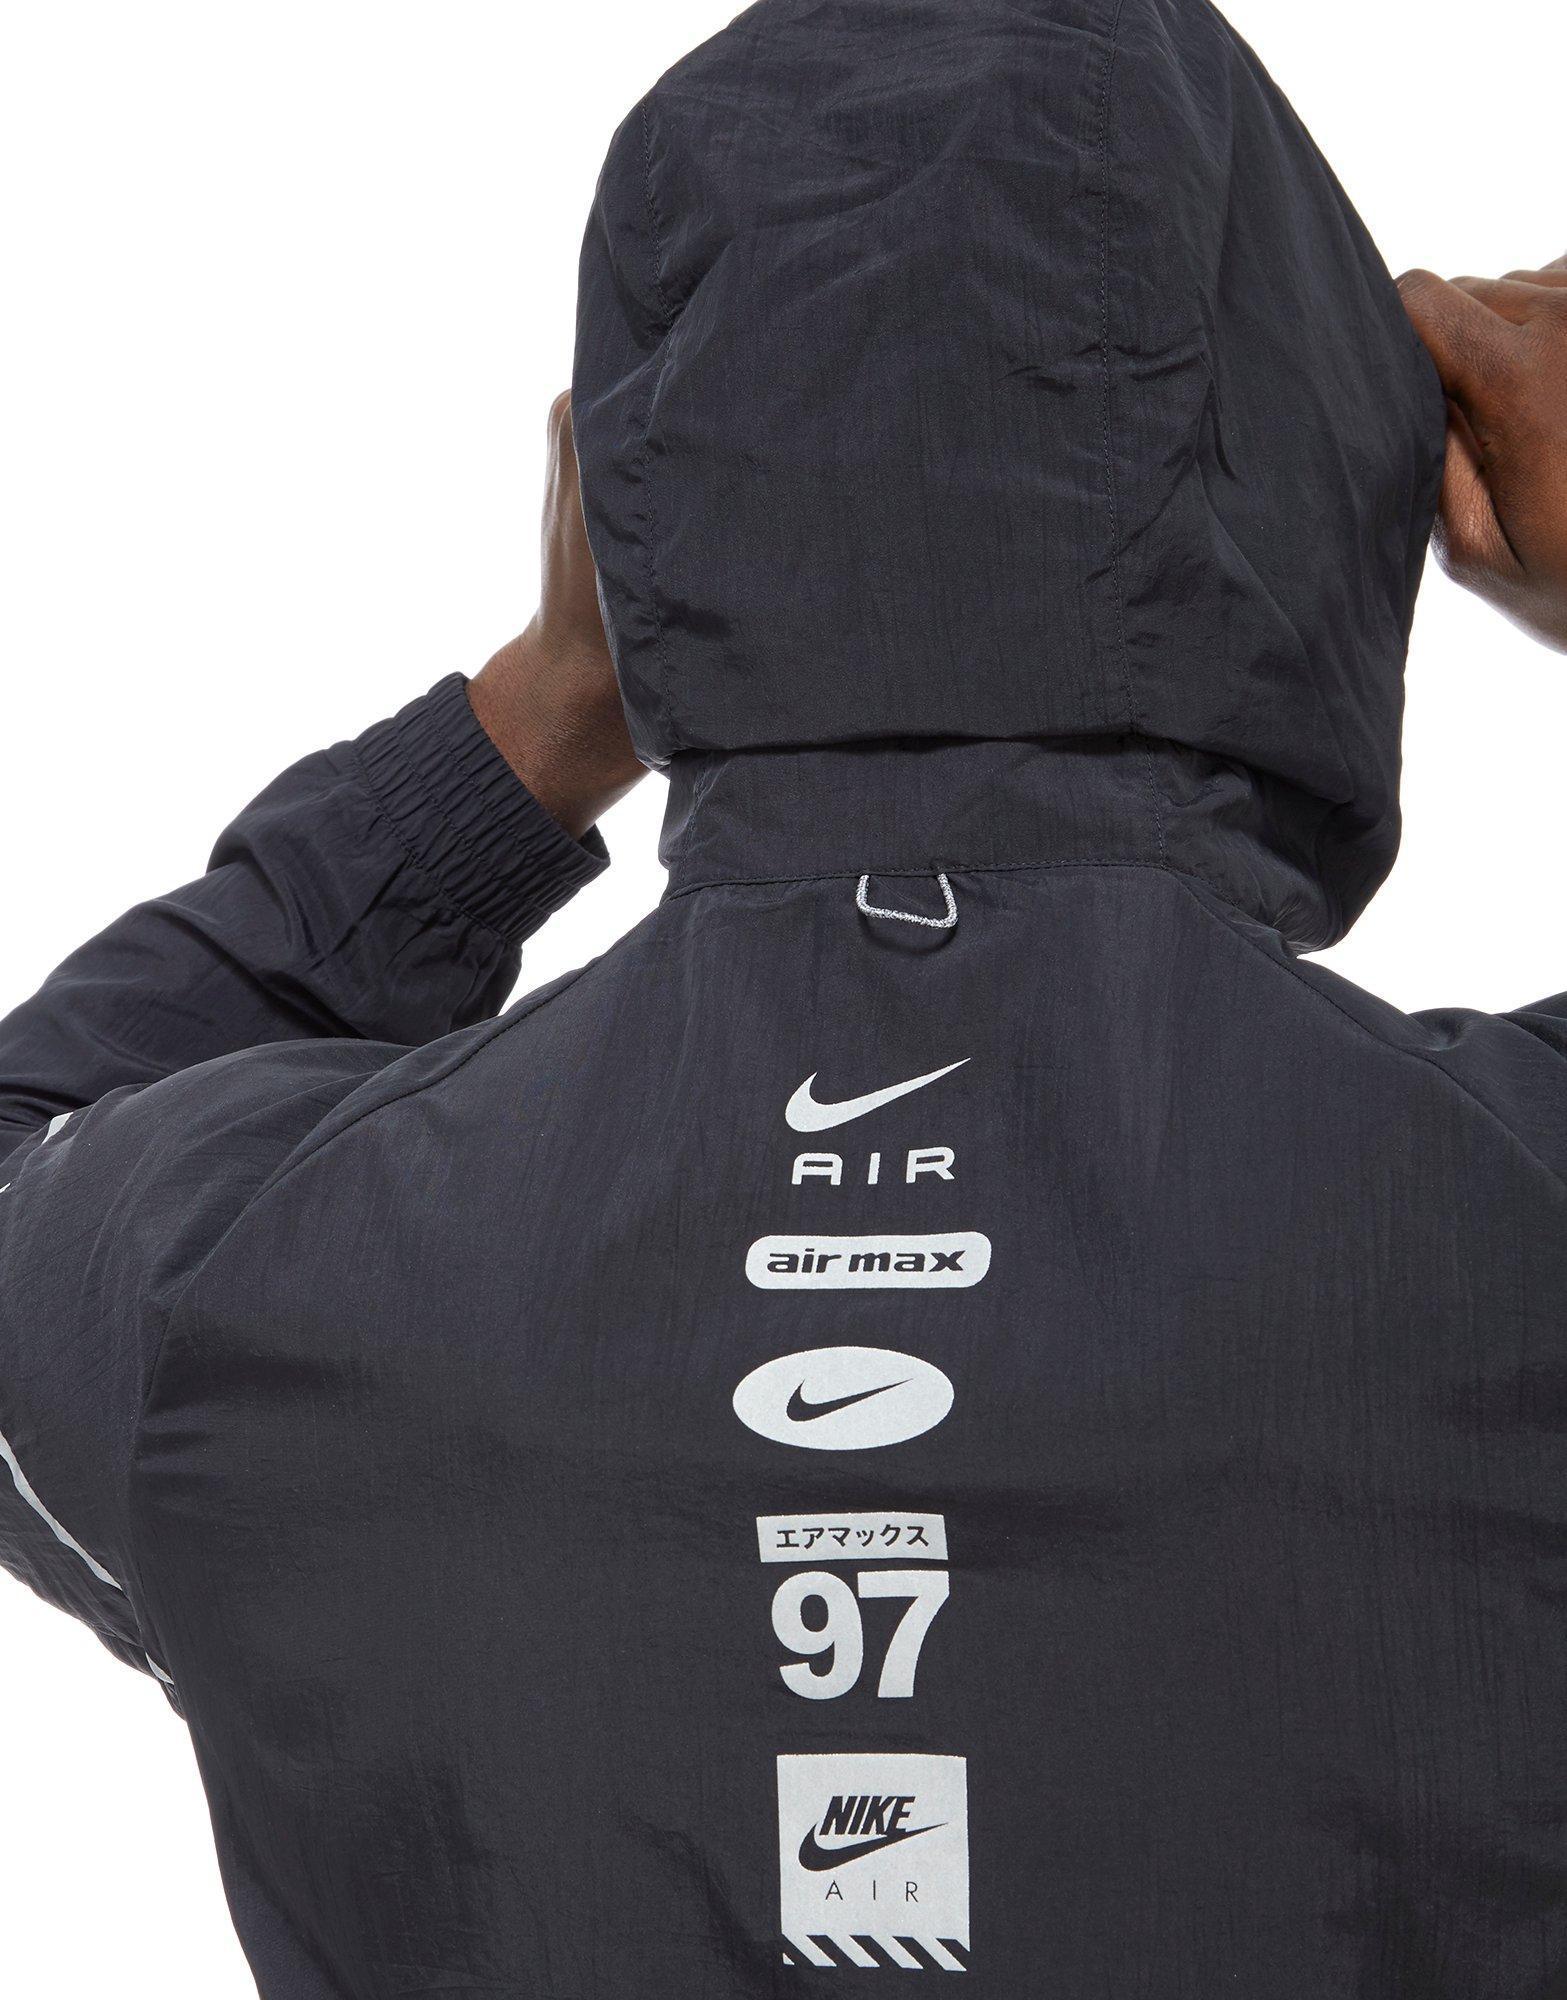 b457b855c683 Nike Air Hybrid 1 2 Zip Woven Jacket in Black for Men - Lyst